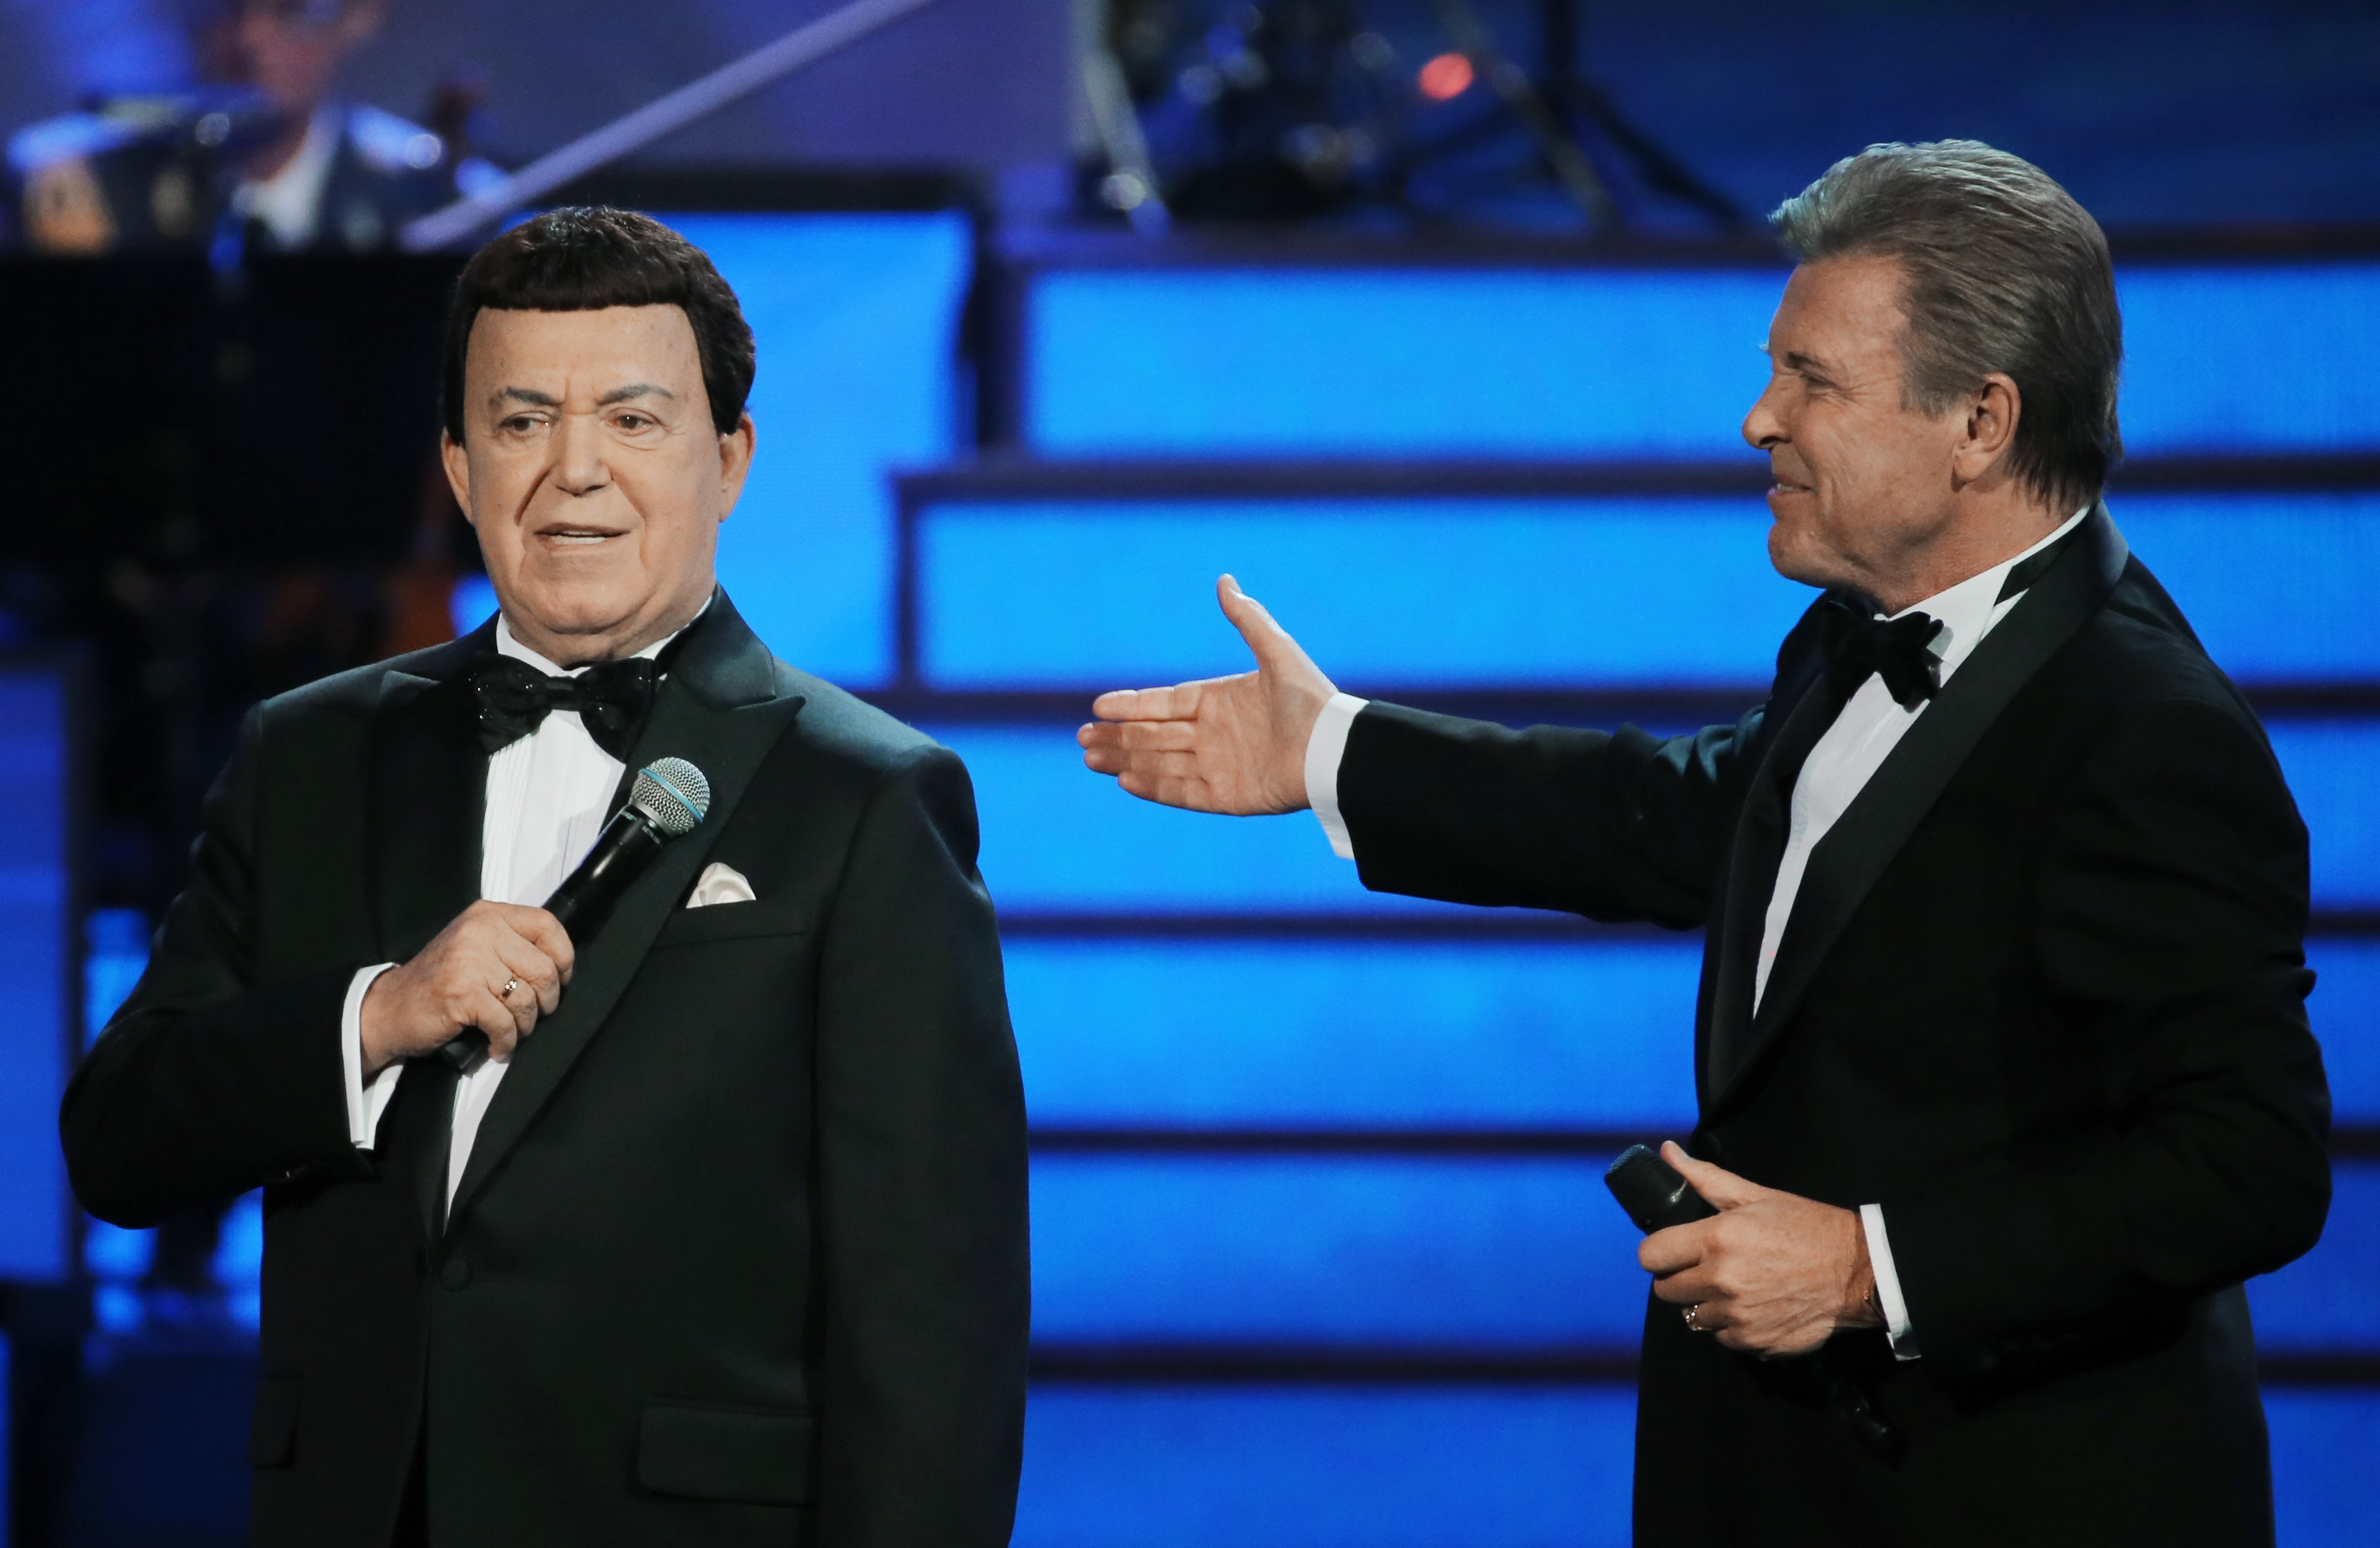 <p>Иосиф Кобзон и Лев Лещенко на концерте в Кремле.&nbsp;</p> <p><span>Фото: &copy; РИА Новости/</span><span>&nbsp;</span>Виталий Белоусов&nbsp;</p>